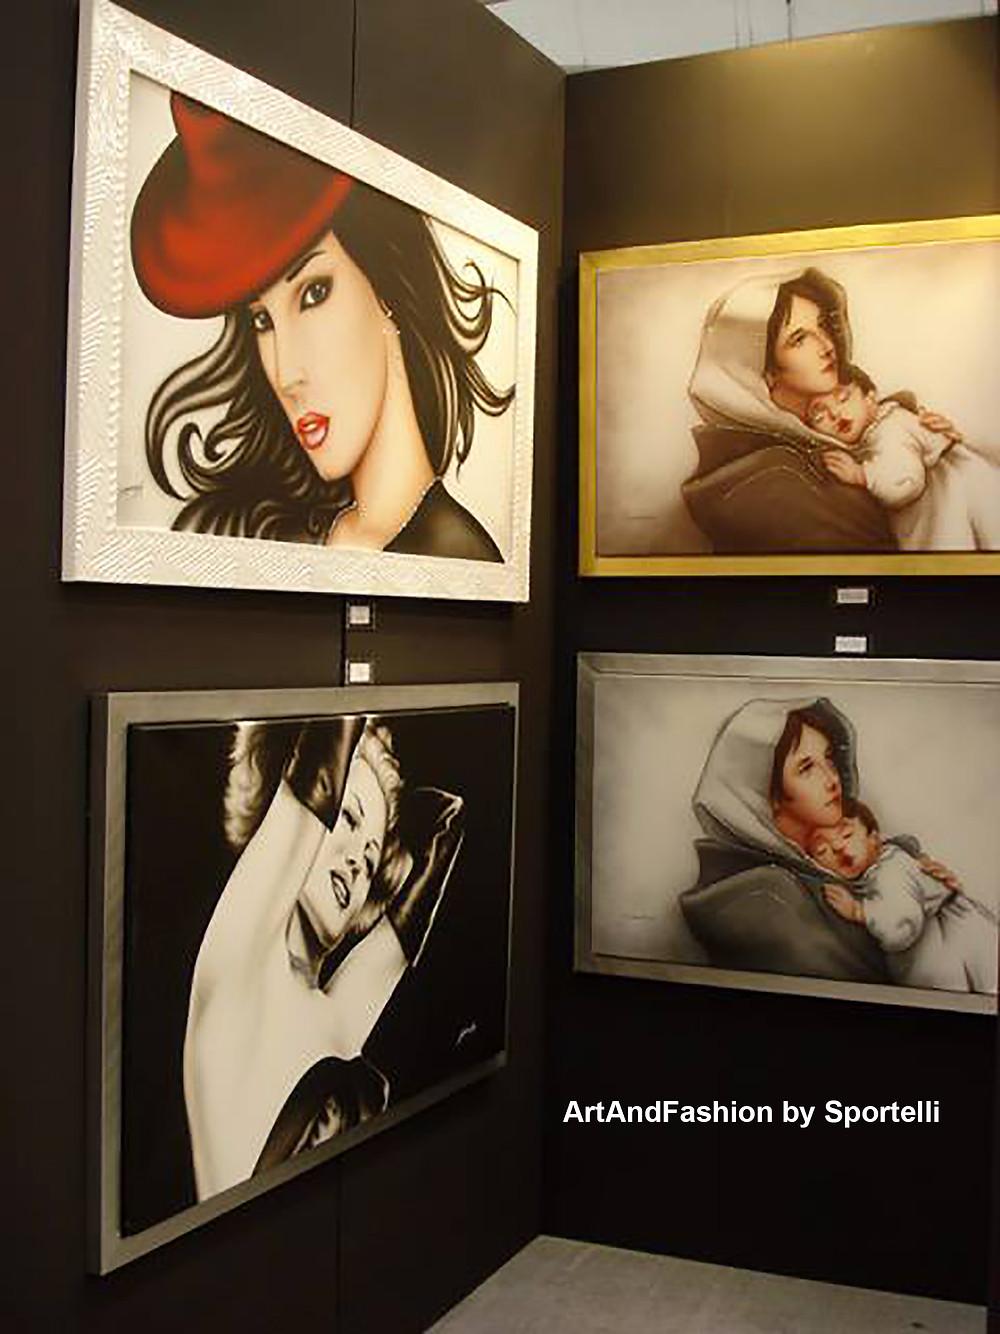 Quadri moderni e cornici varie ArtAndFashion by Sportelli